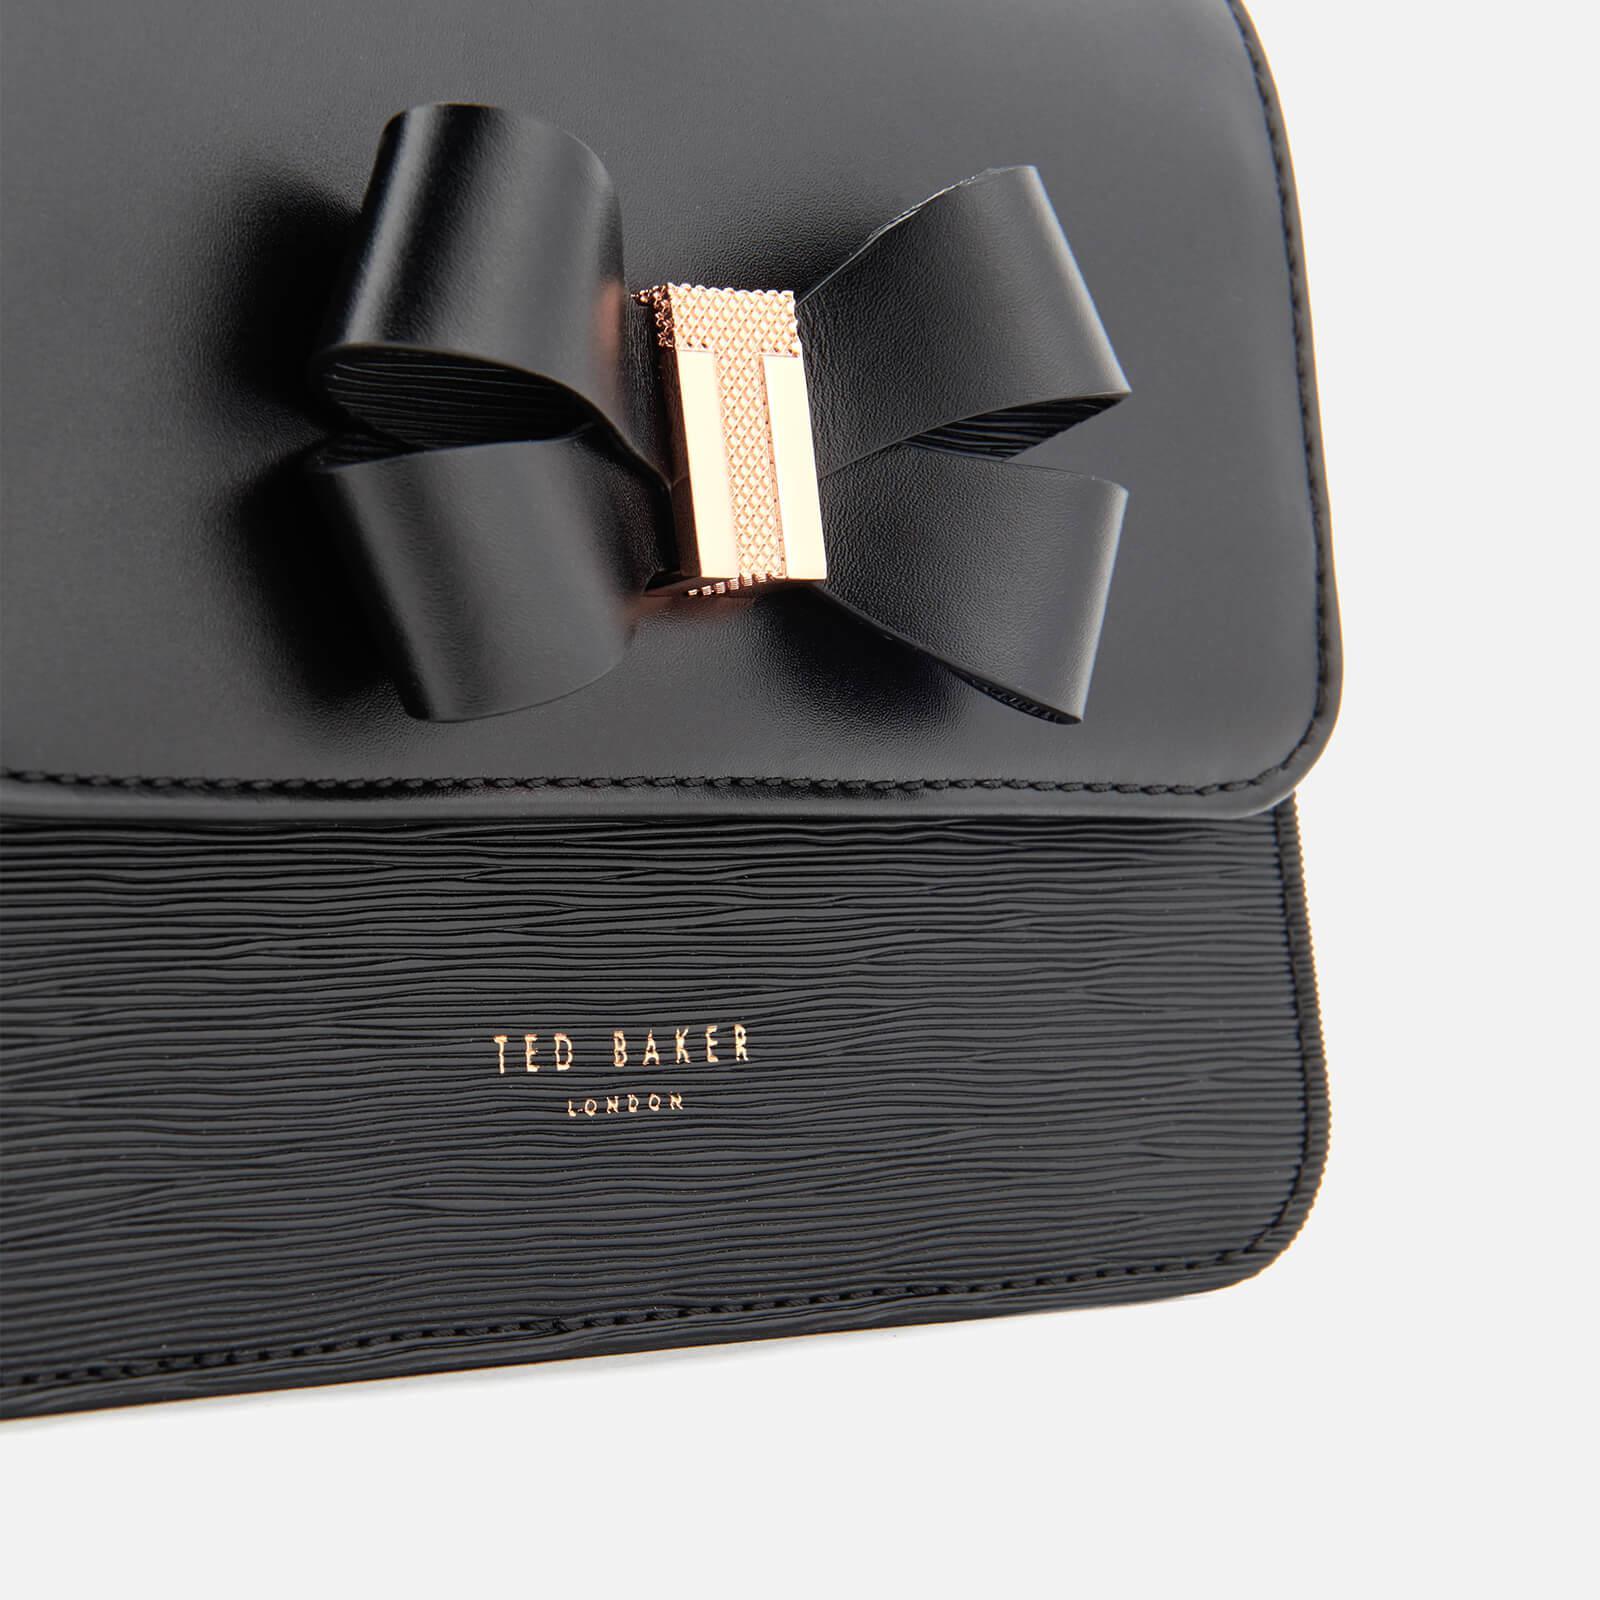 Ted Baker Leather Calliih Bow Detail Cross Body Bag in Black